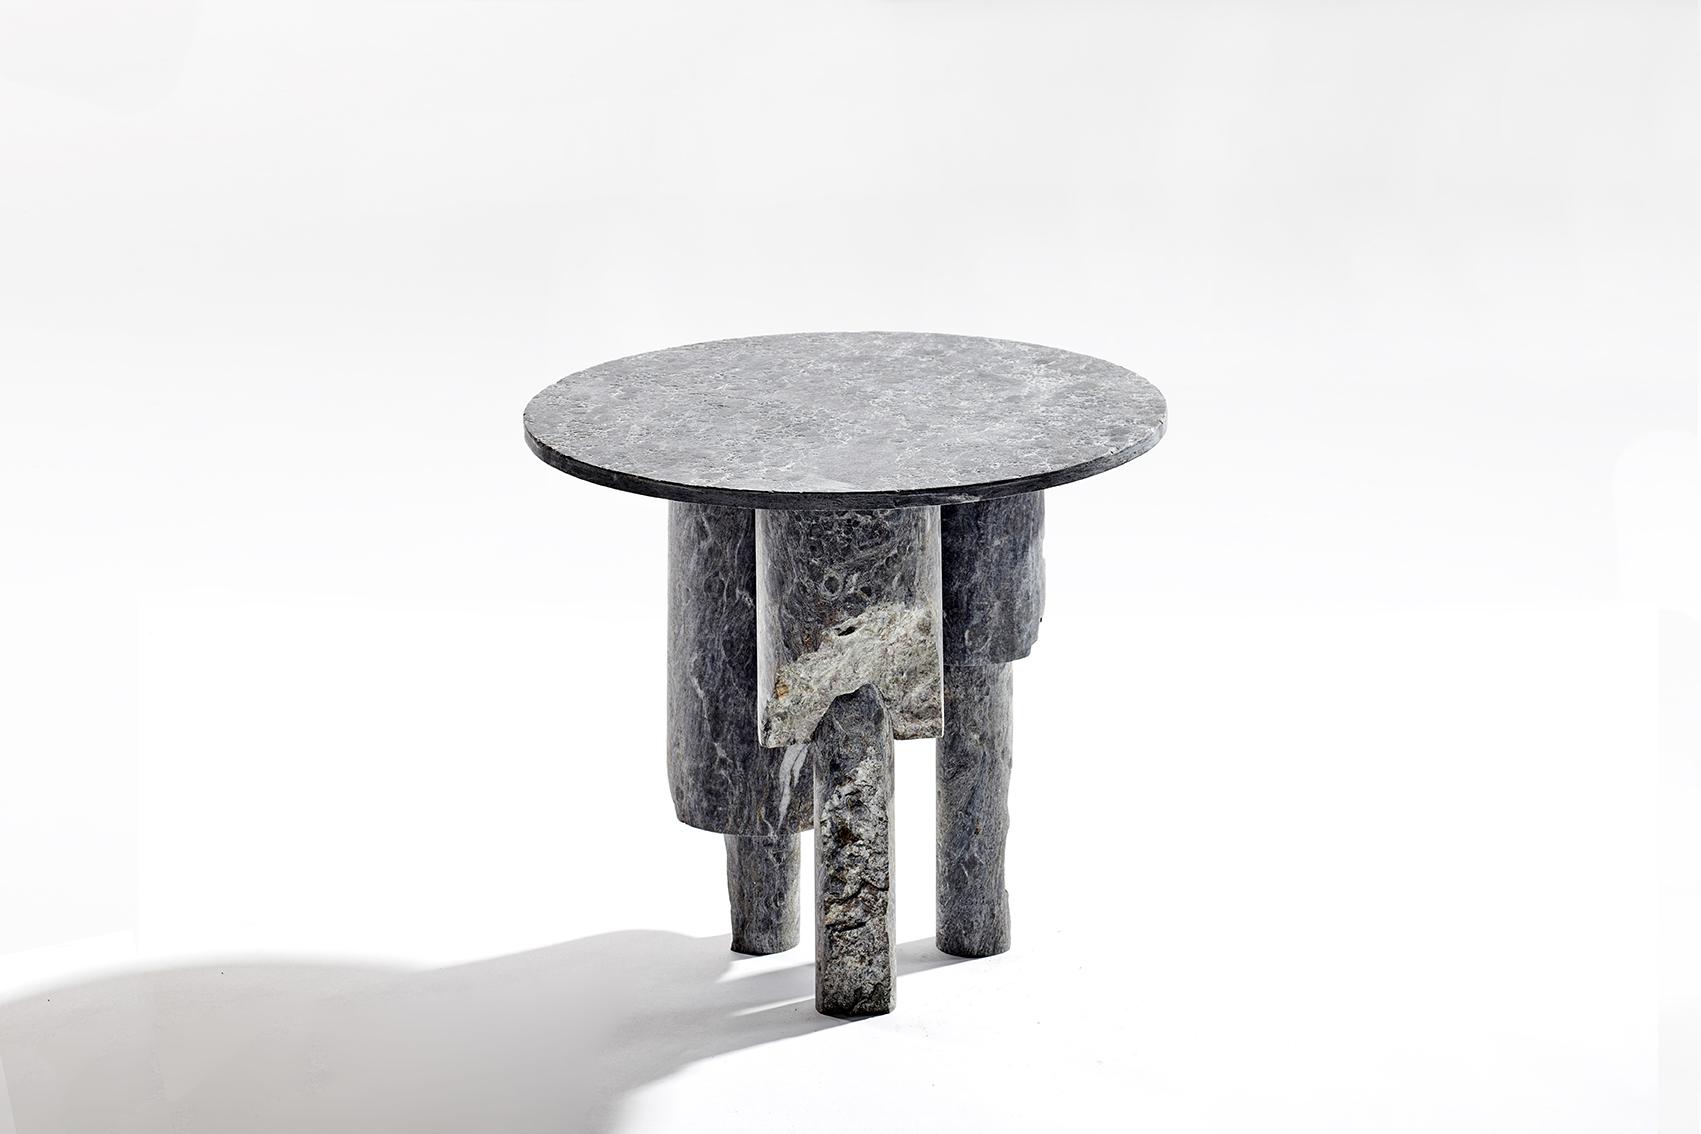 munoz-josefina-design-marble-black_tables-6.jpg